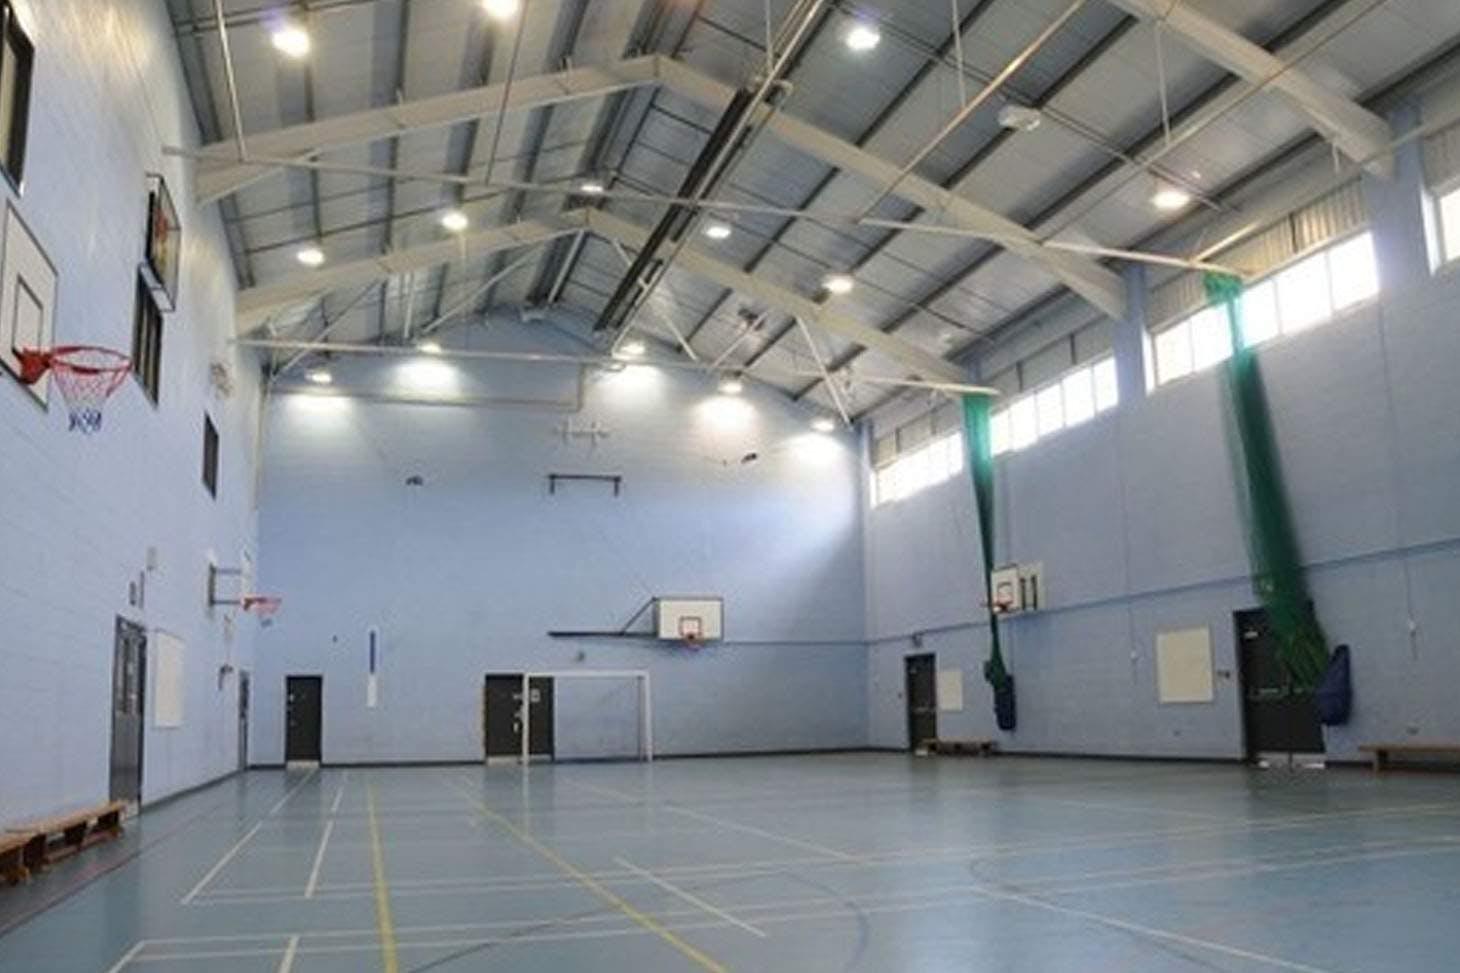 Childwall Sports & Science Academy Indoor badminton court